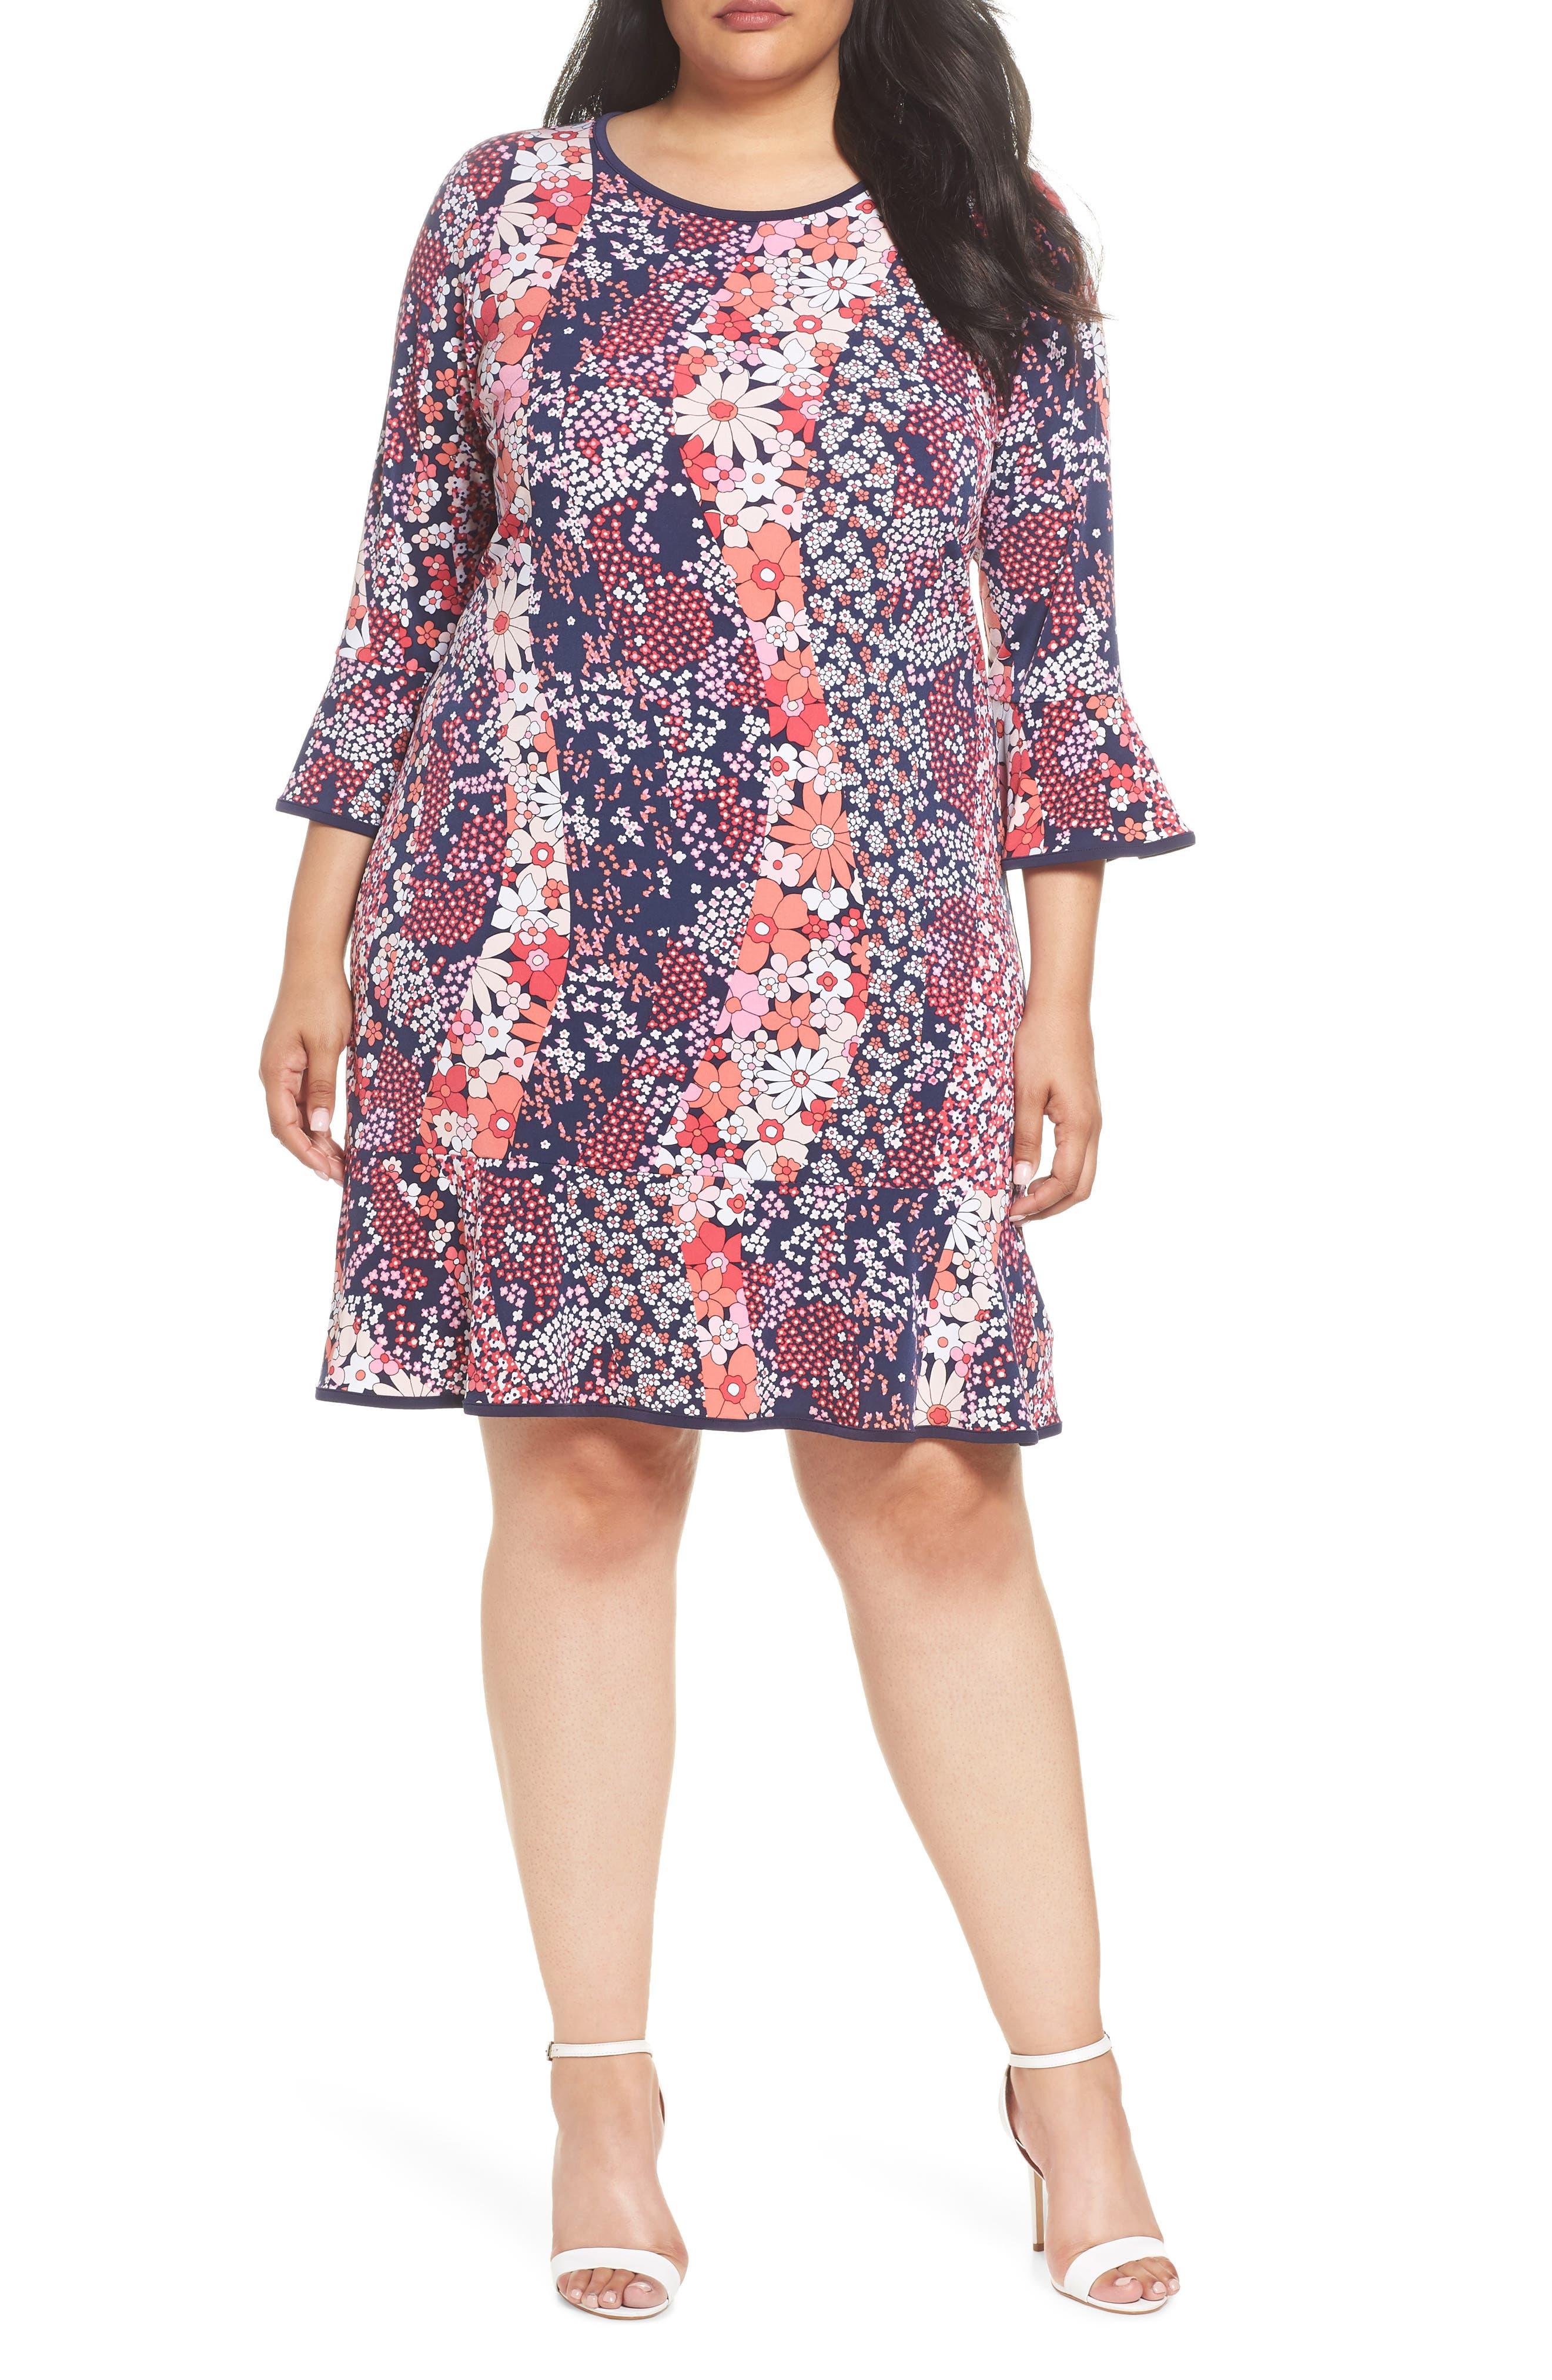 MICHAEL MICHAEL KORS,                             Patchwork Floral Bell Sleeve Shift Dress,                             Main thumbnail 1, color,                             679